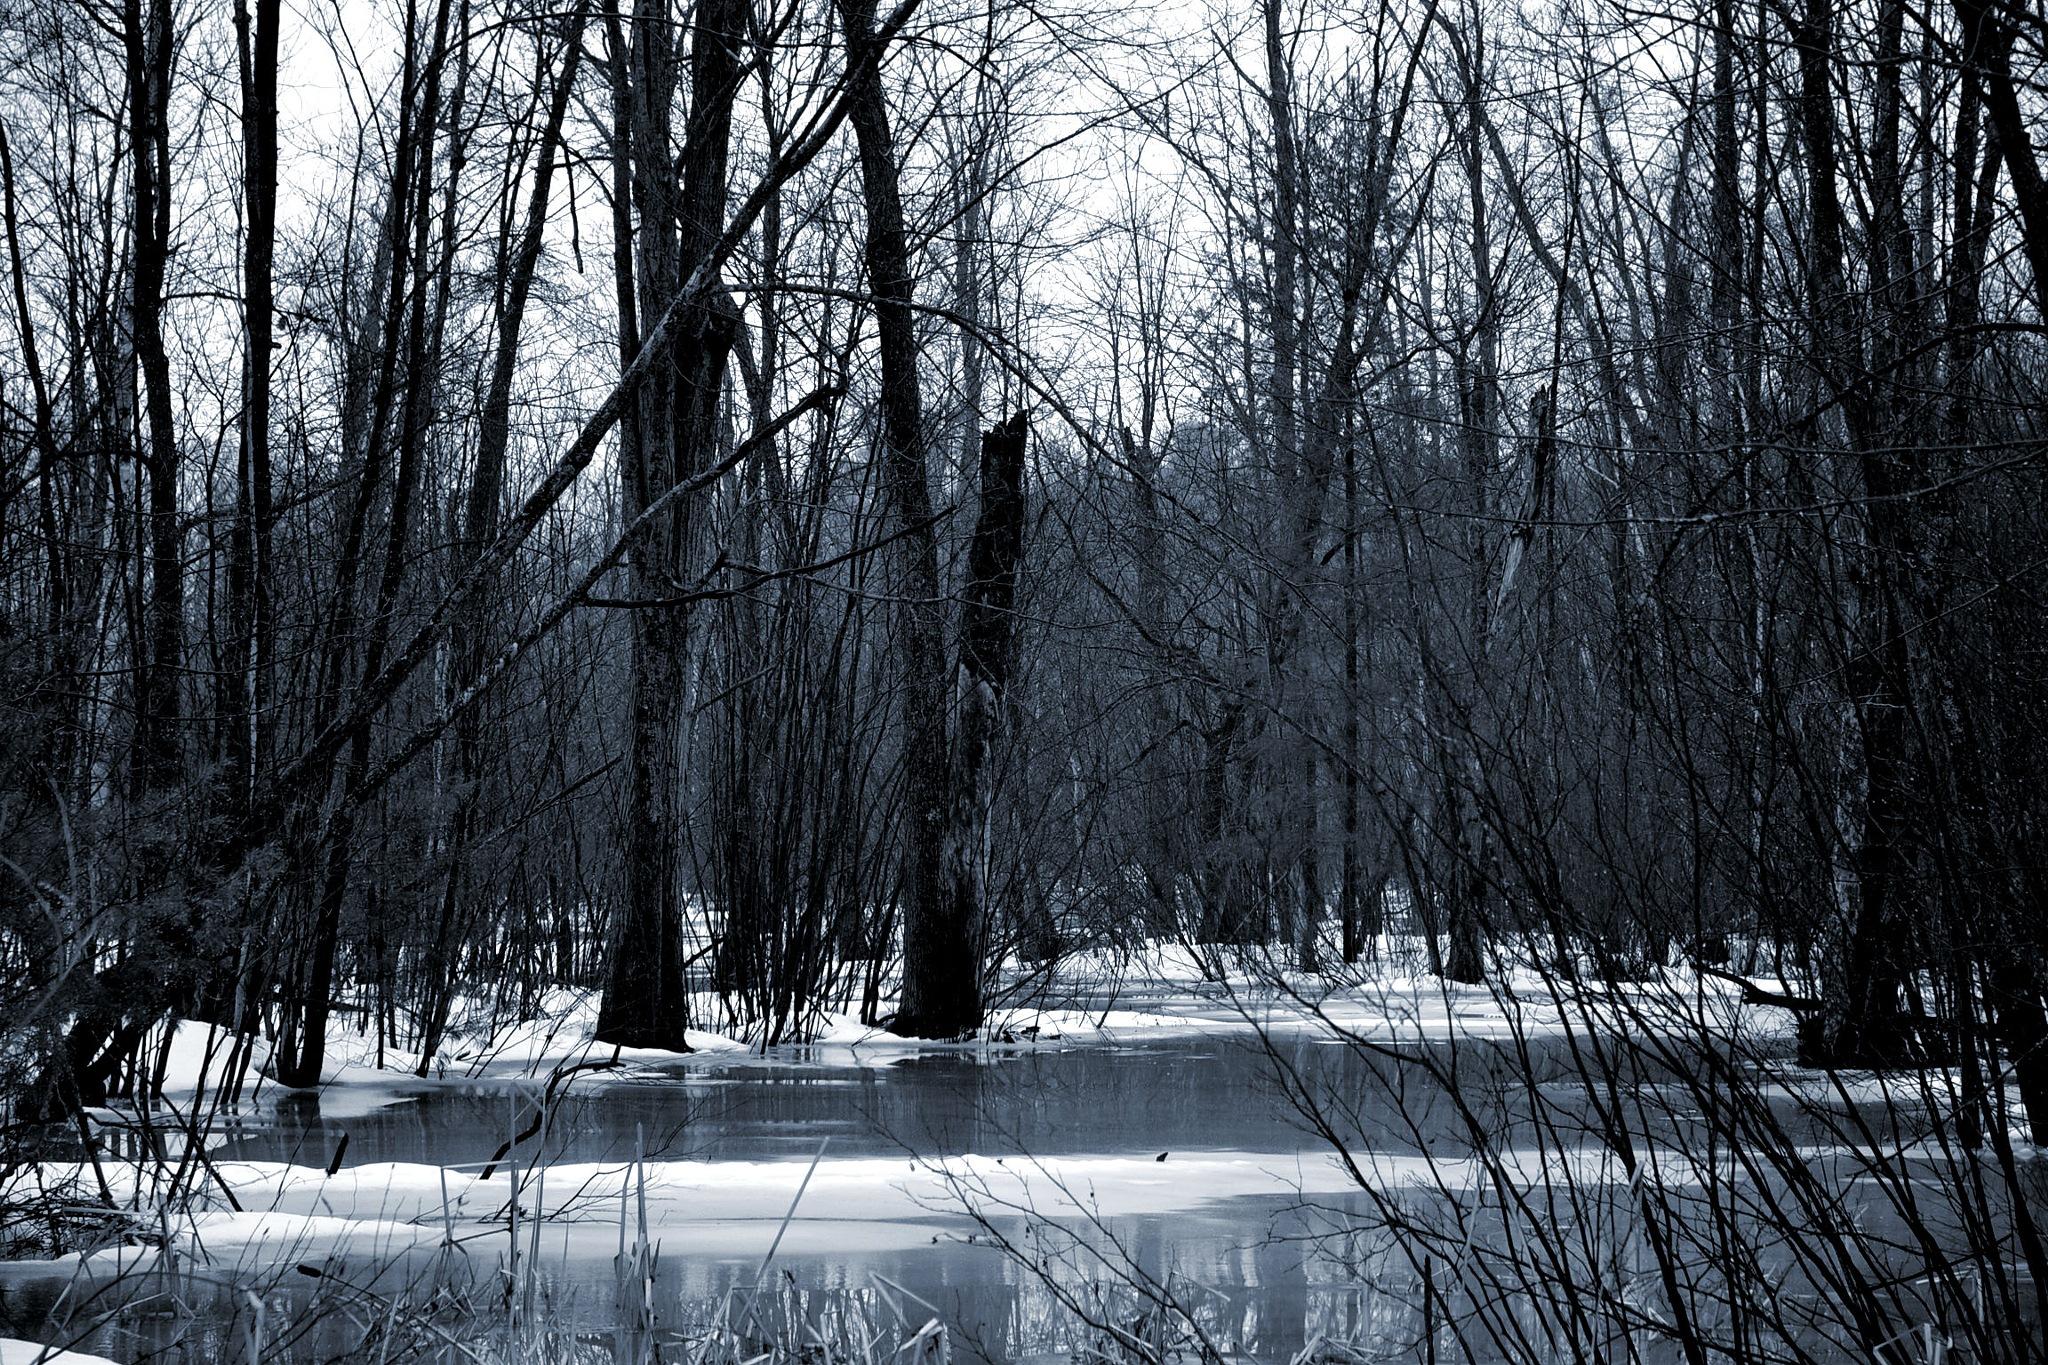 Swamp by Steve Webb